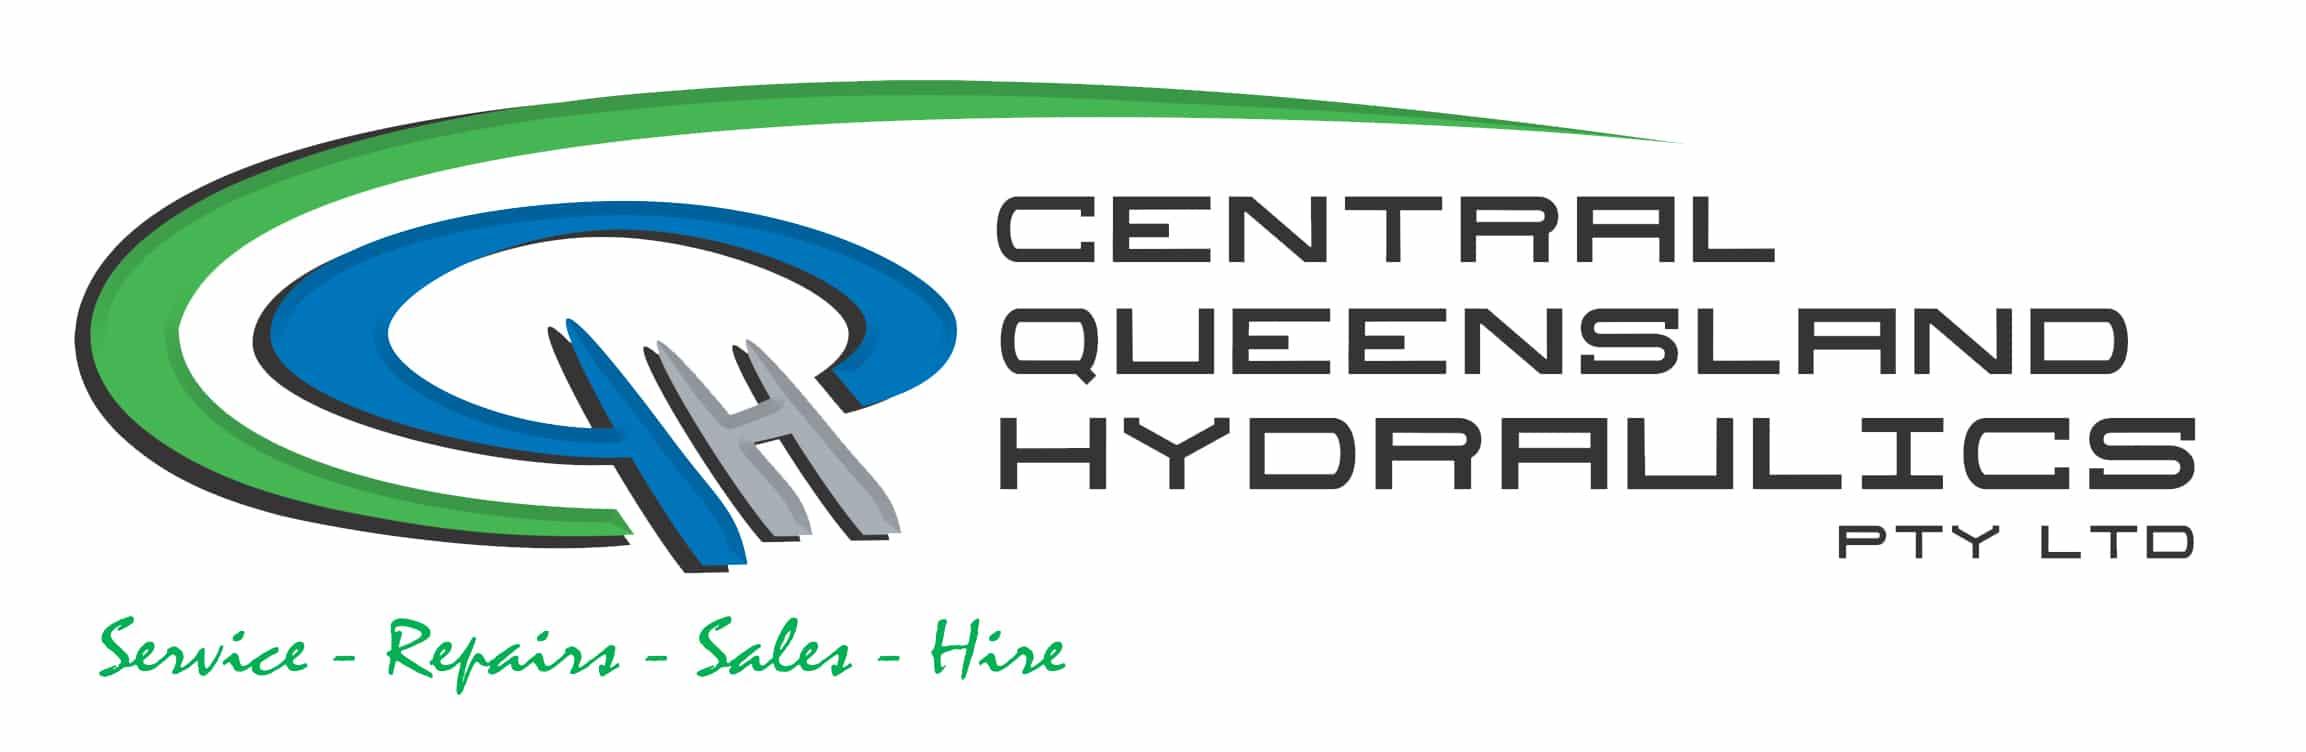 Central Queensland Hydraulics -